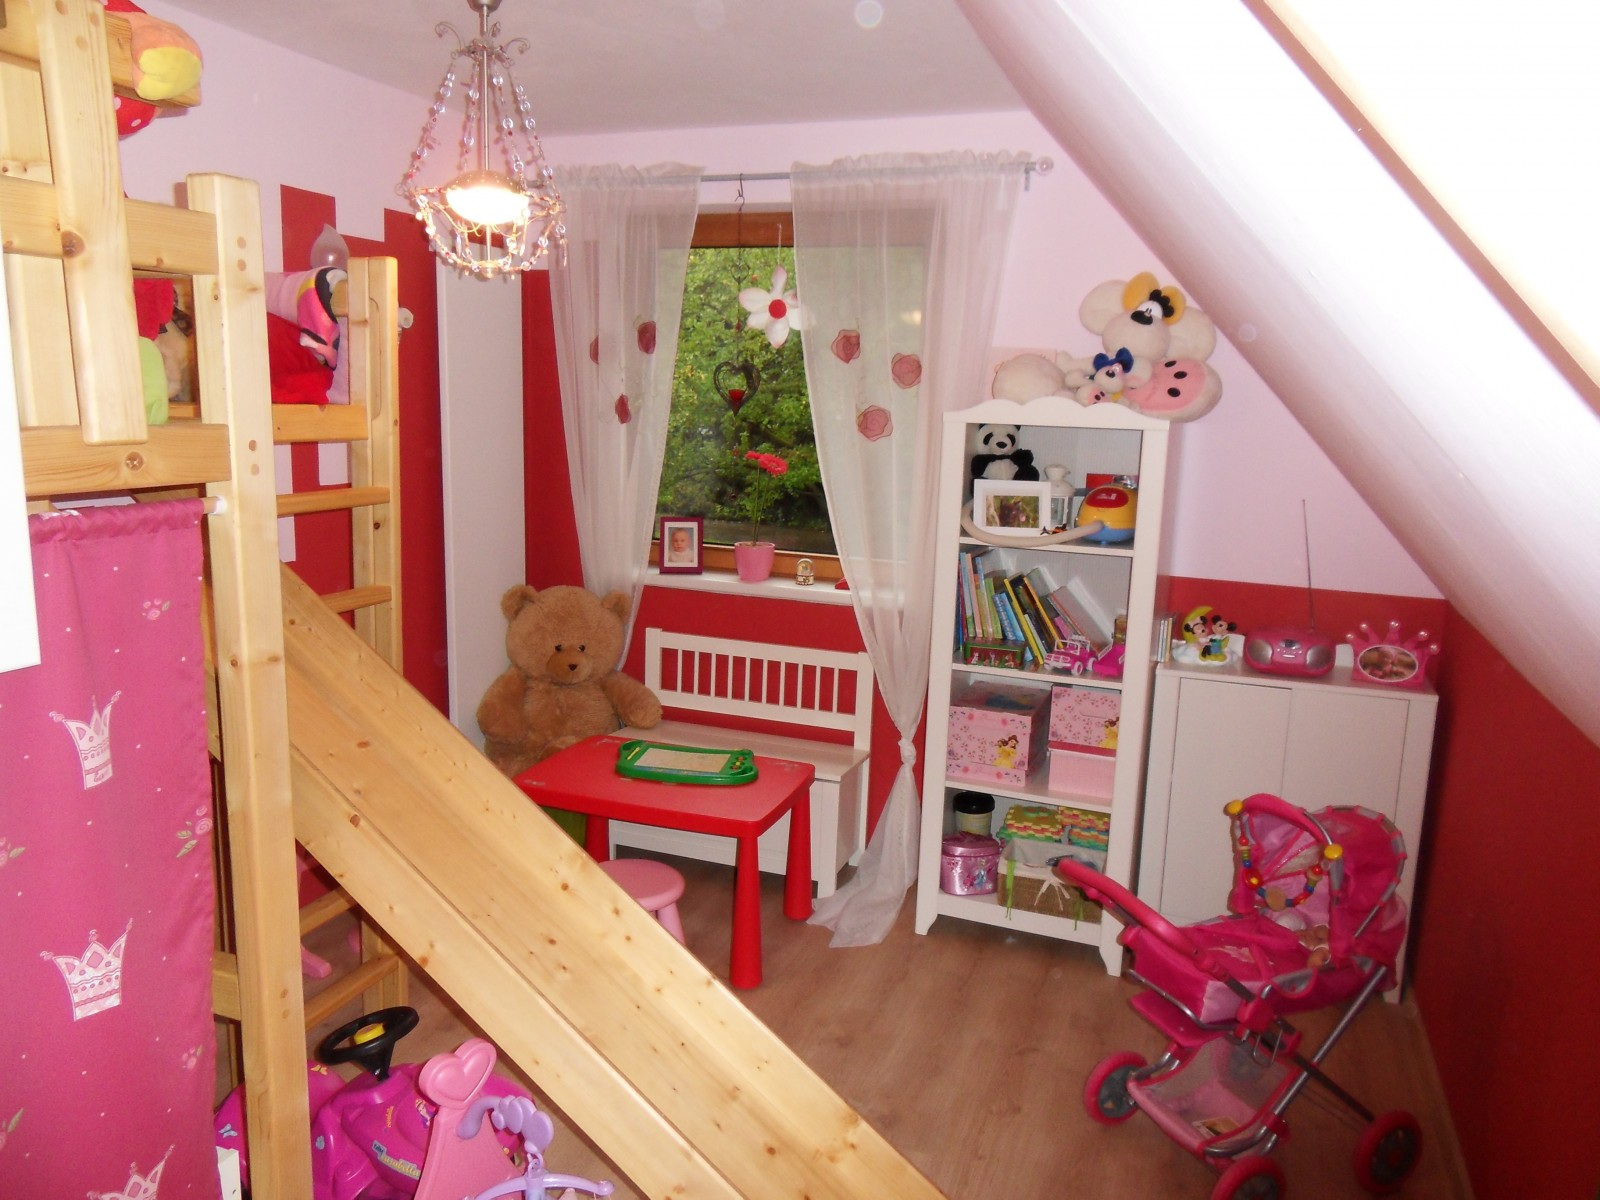 Full Size of Kinderzimmer Deko Prinzessin Lillifee Komplett Prinzessinnen Playmobil Gebraucht Jugendzimmer 6852   Prinzessinnen Kinderzimmer Pinolino Karolin Gestalten Kinderzimmer Kinderzimmer Prinzessin